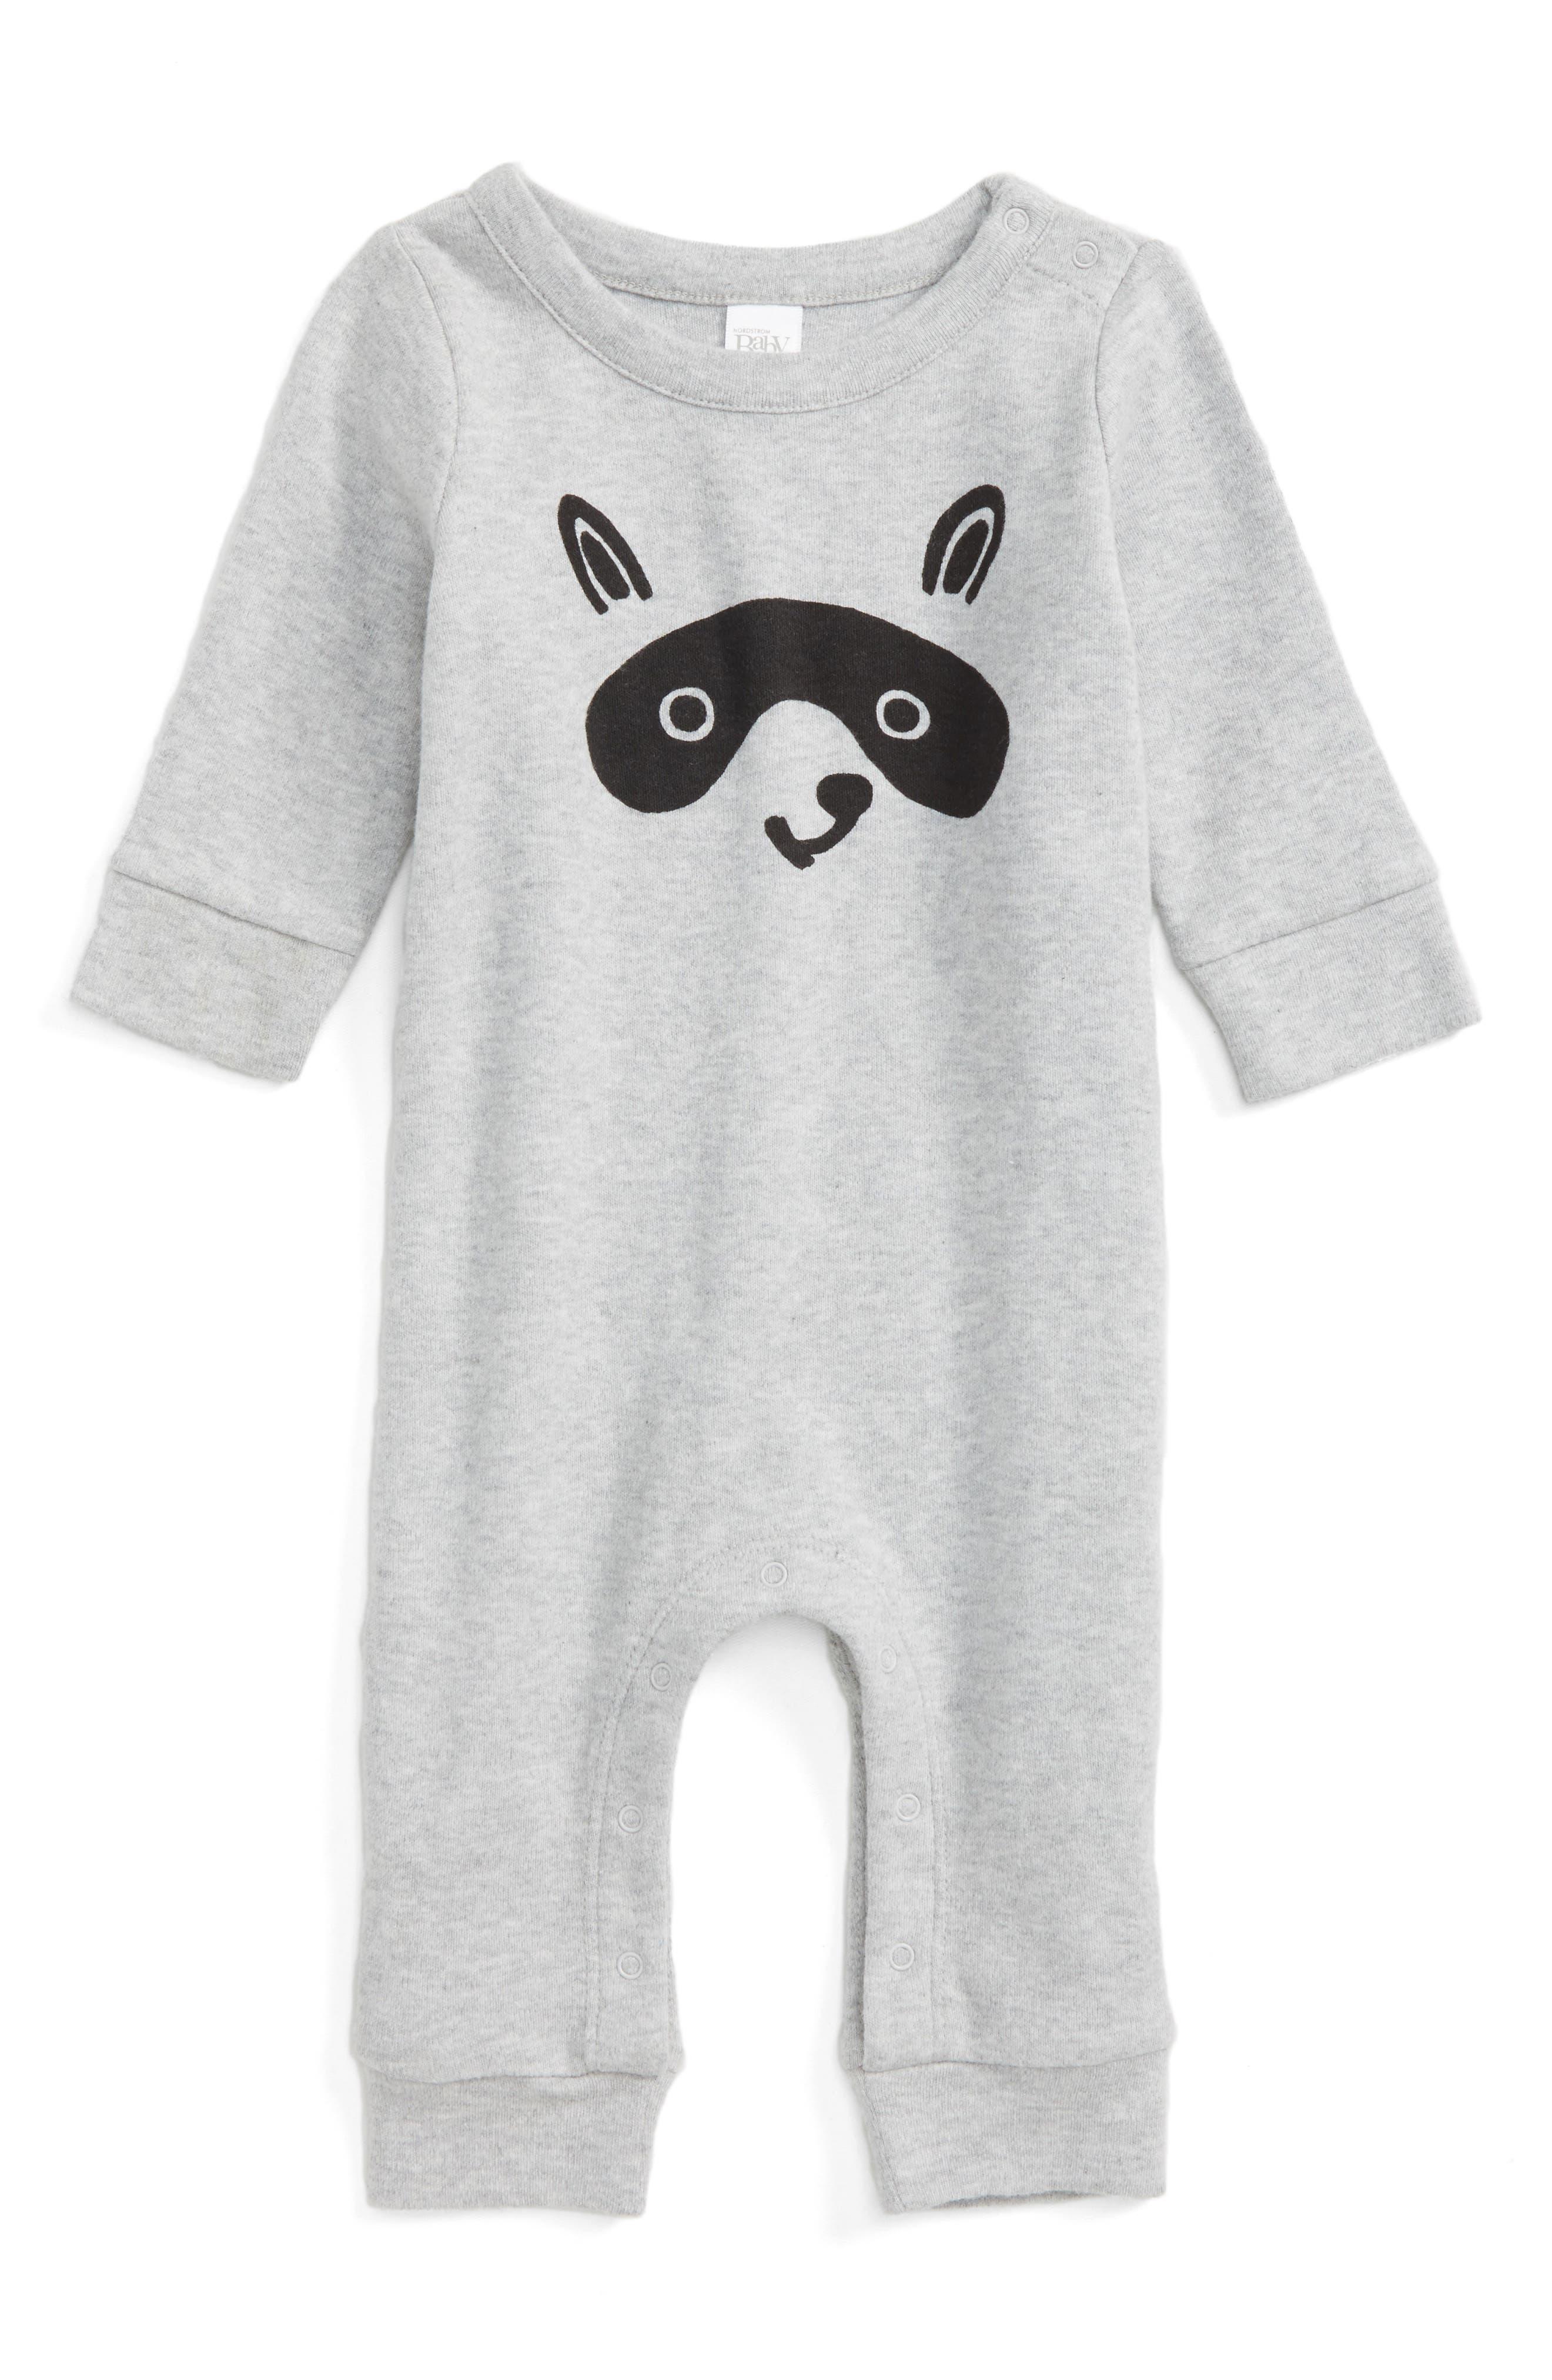 Nordstrom Baby Raccoon Face Romper (Baby)